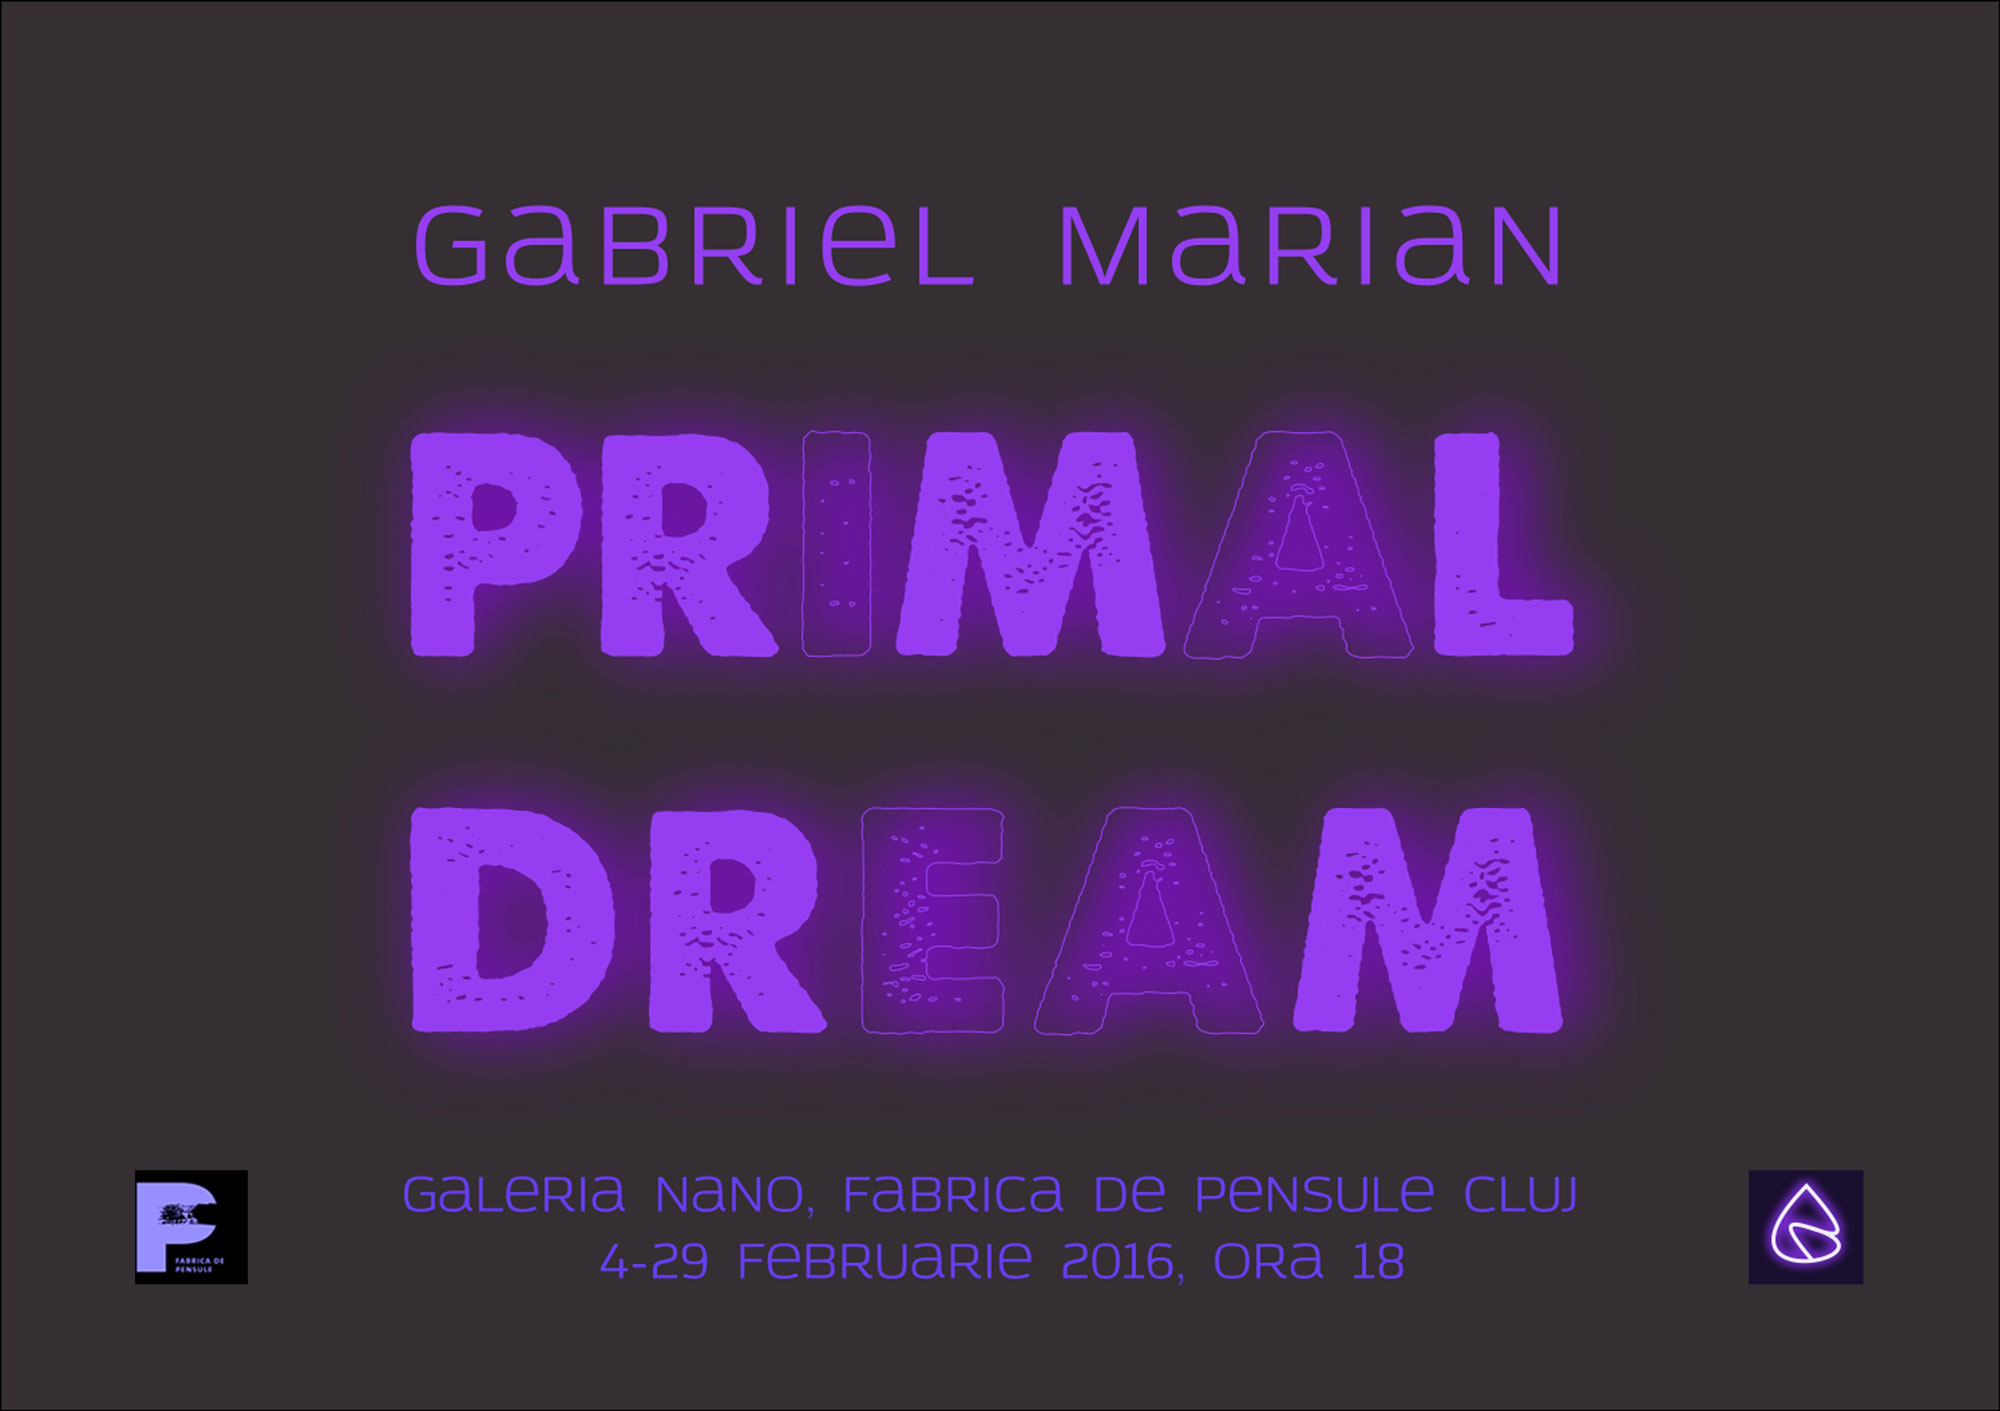 PRML-DRM-7-violet-glow-poster1-fab-PS-L-J